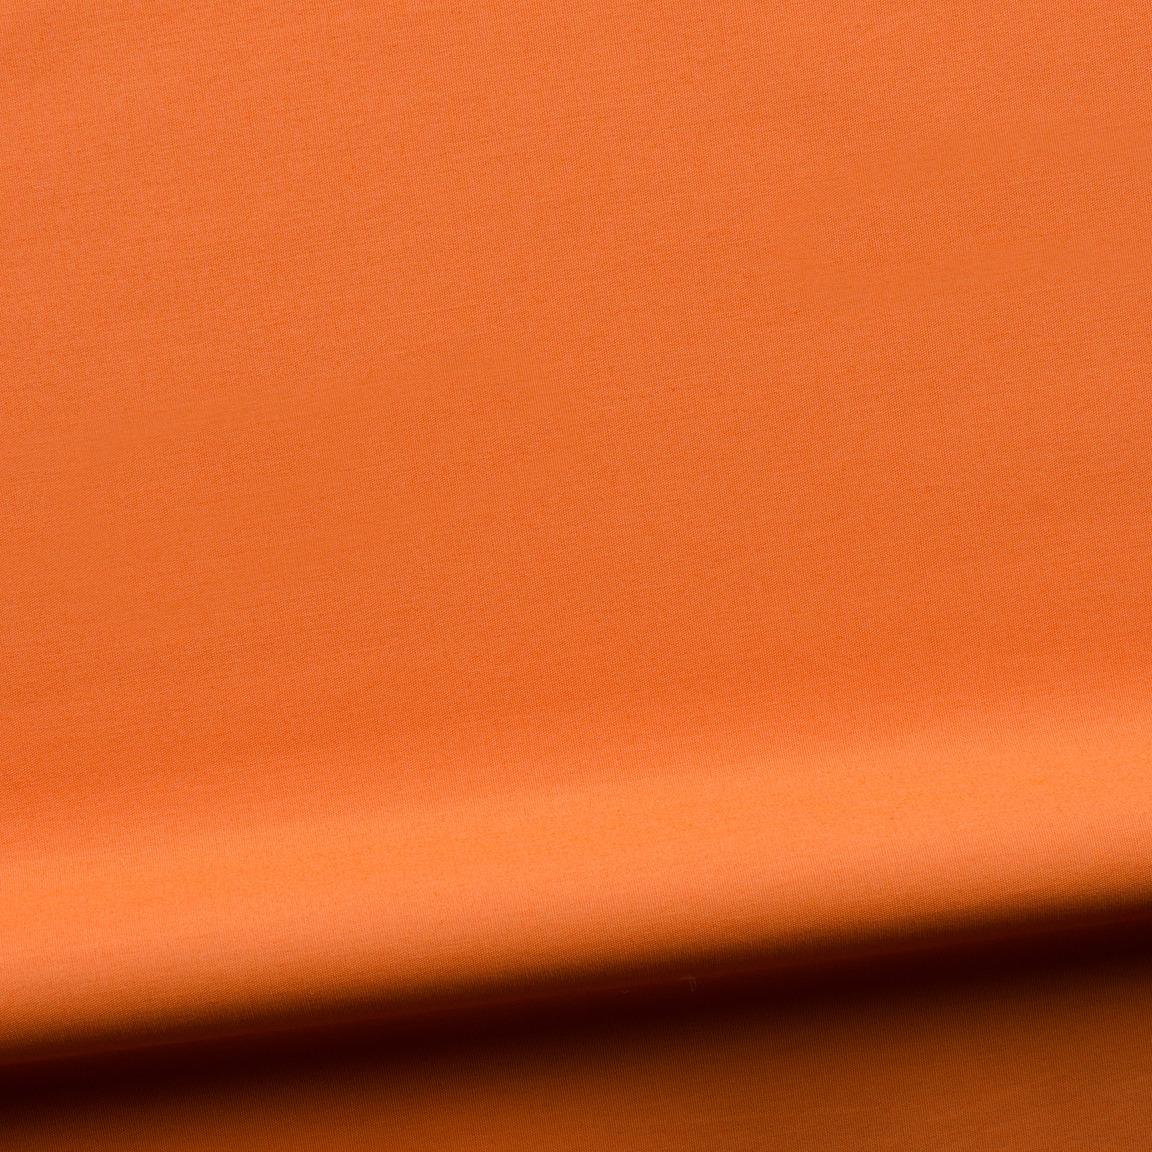 Milano, orange